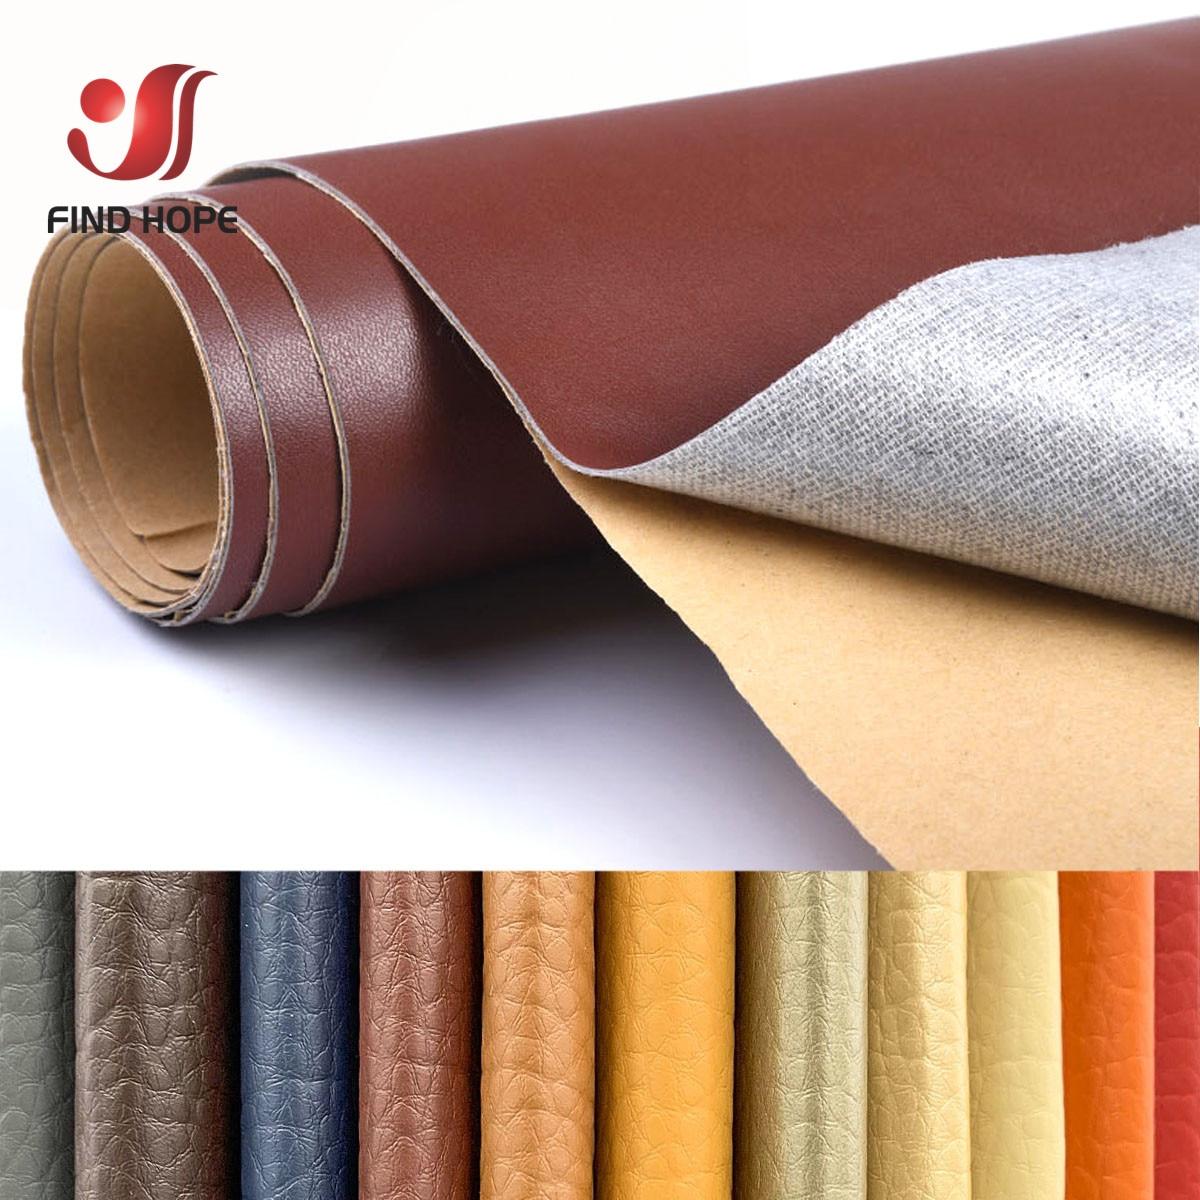 A4 A5 40*120cm Litchi Pattern Back  Self-adhesive Stick Faux PU Leather Fabric Repair Patch Sticker For Sofa Car Bag DIY Craft 1